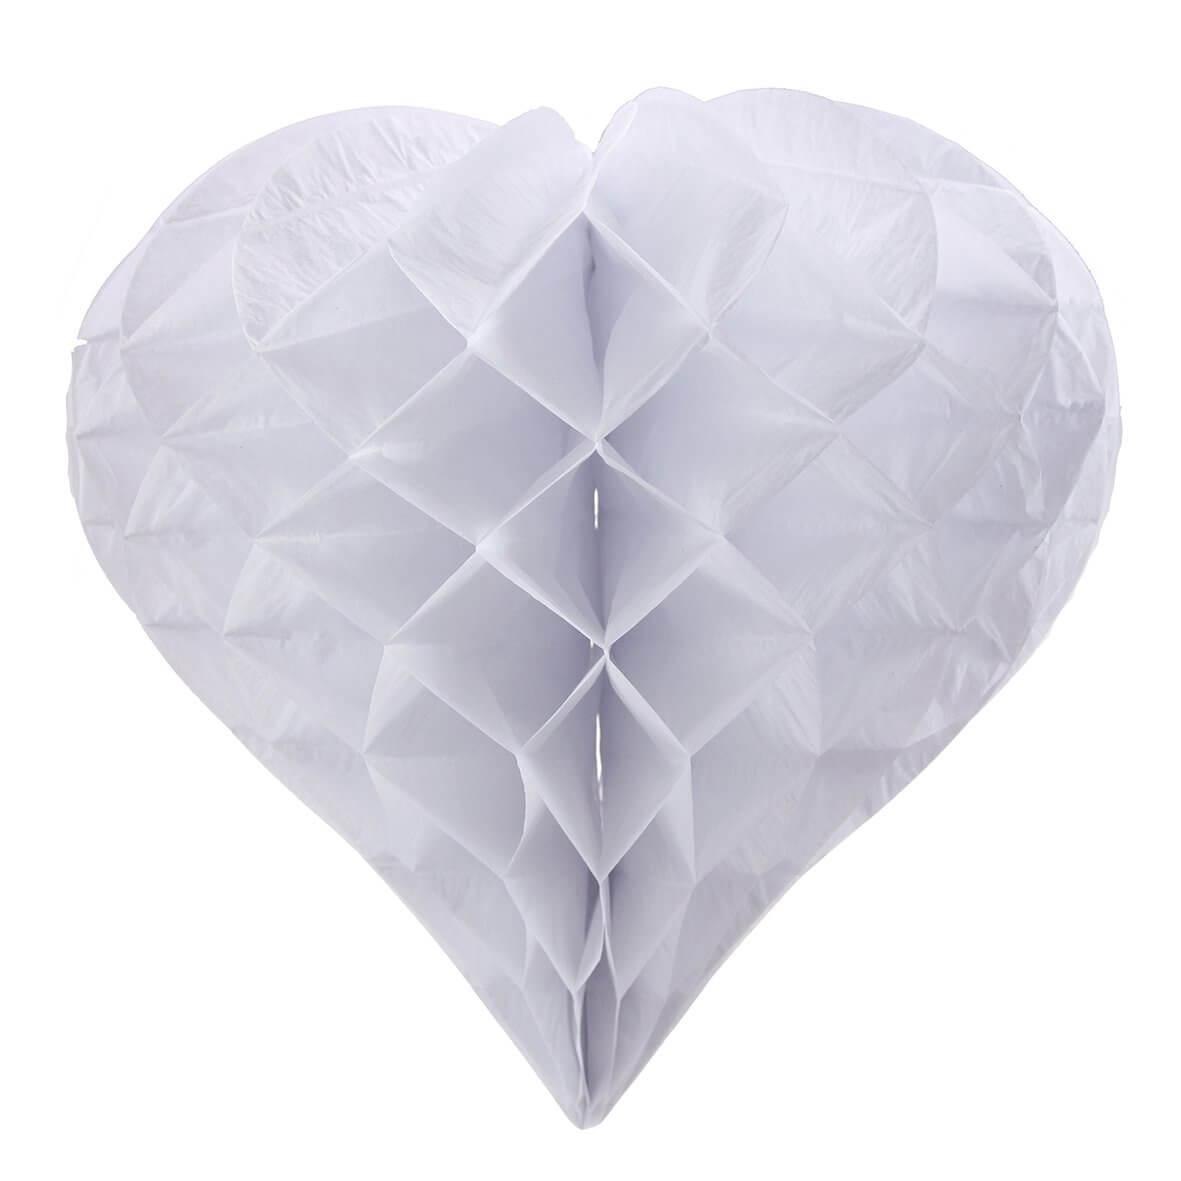 Large Heart-Shaped White Honeycomb Paper Decoration